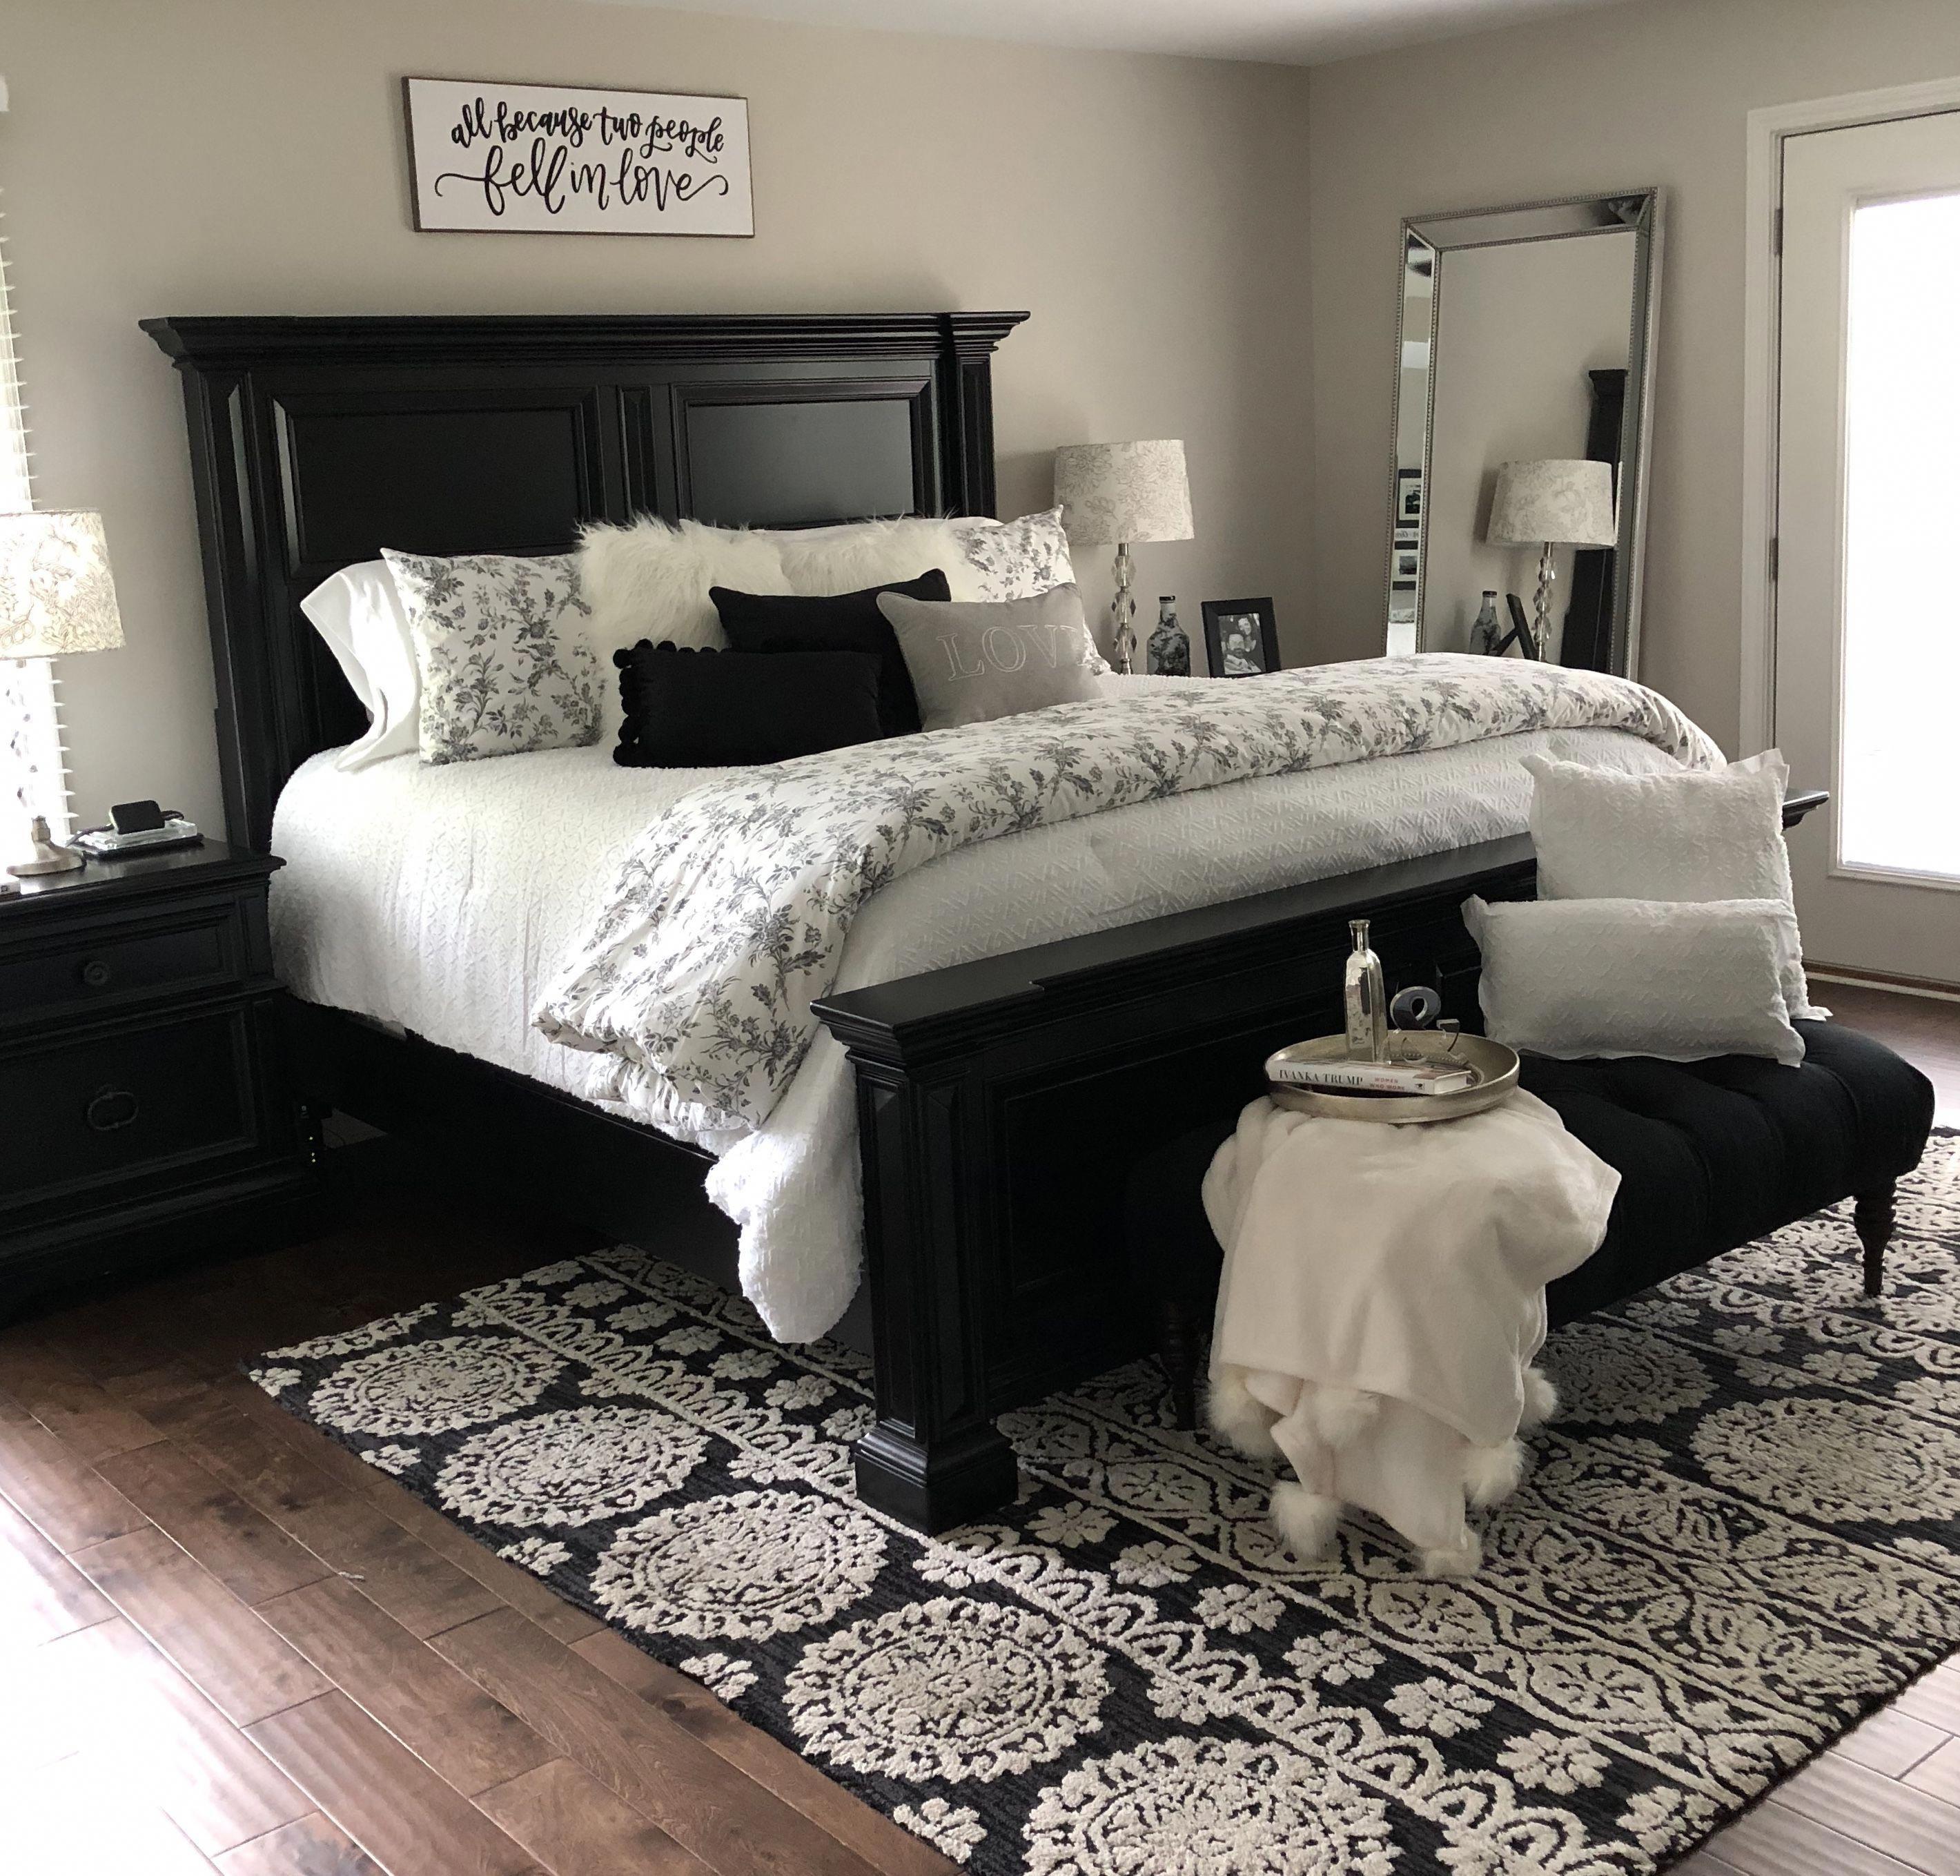 #bedroomdiyideas | Bedroom decor for couples, Bedroom ...